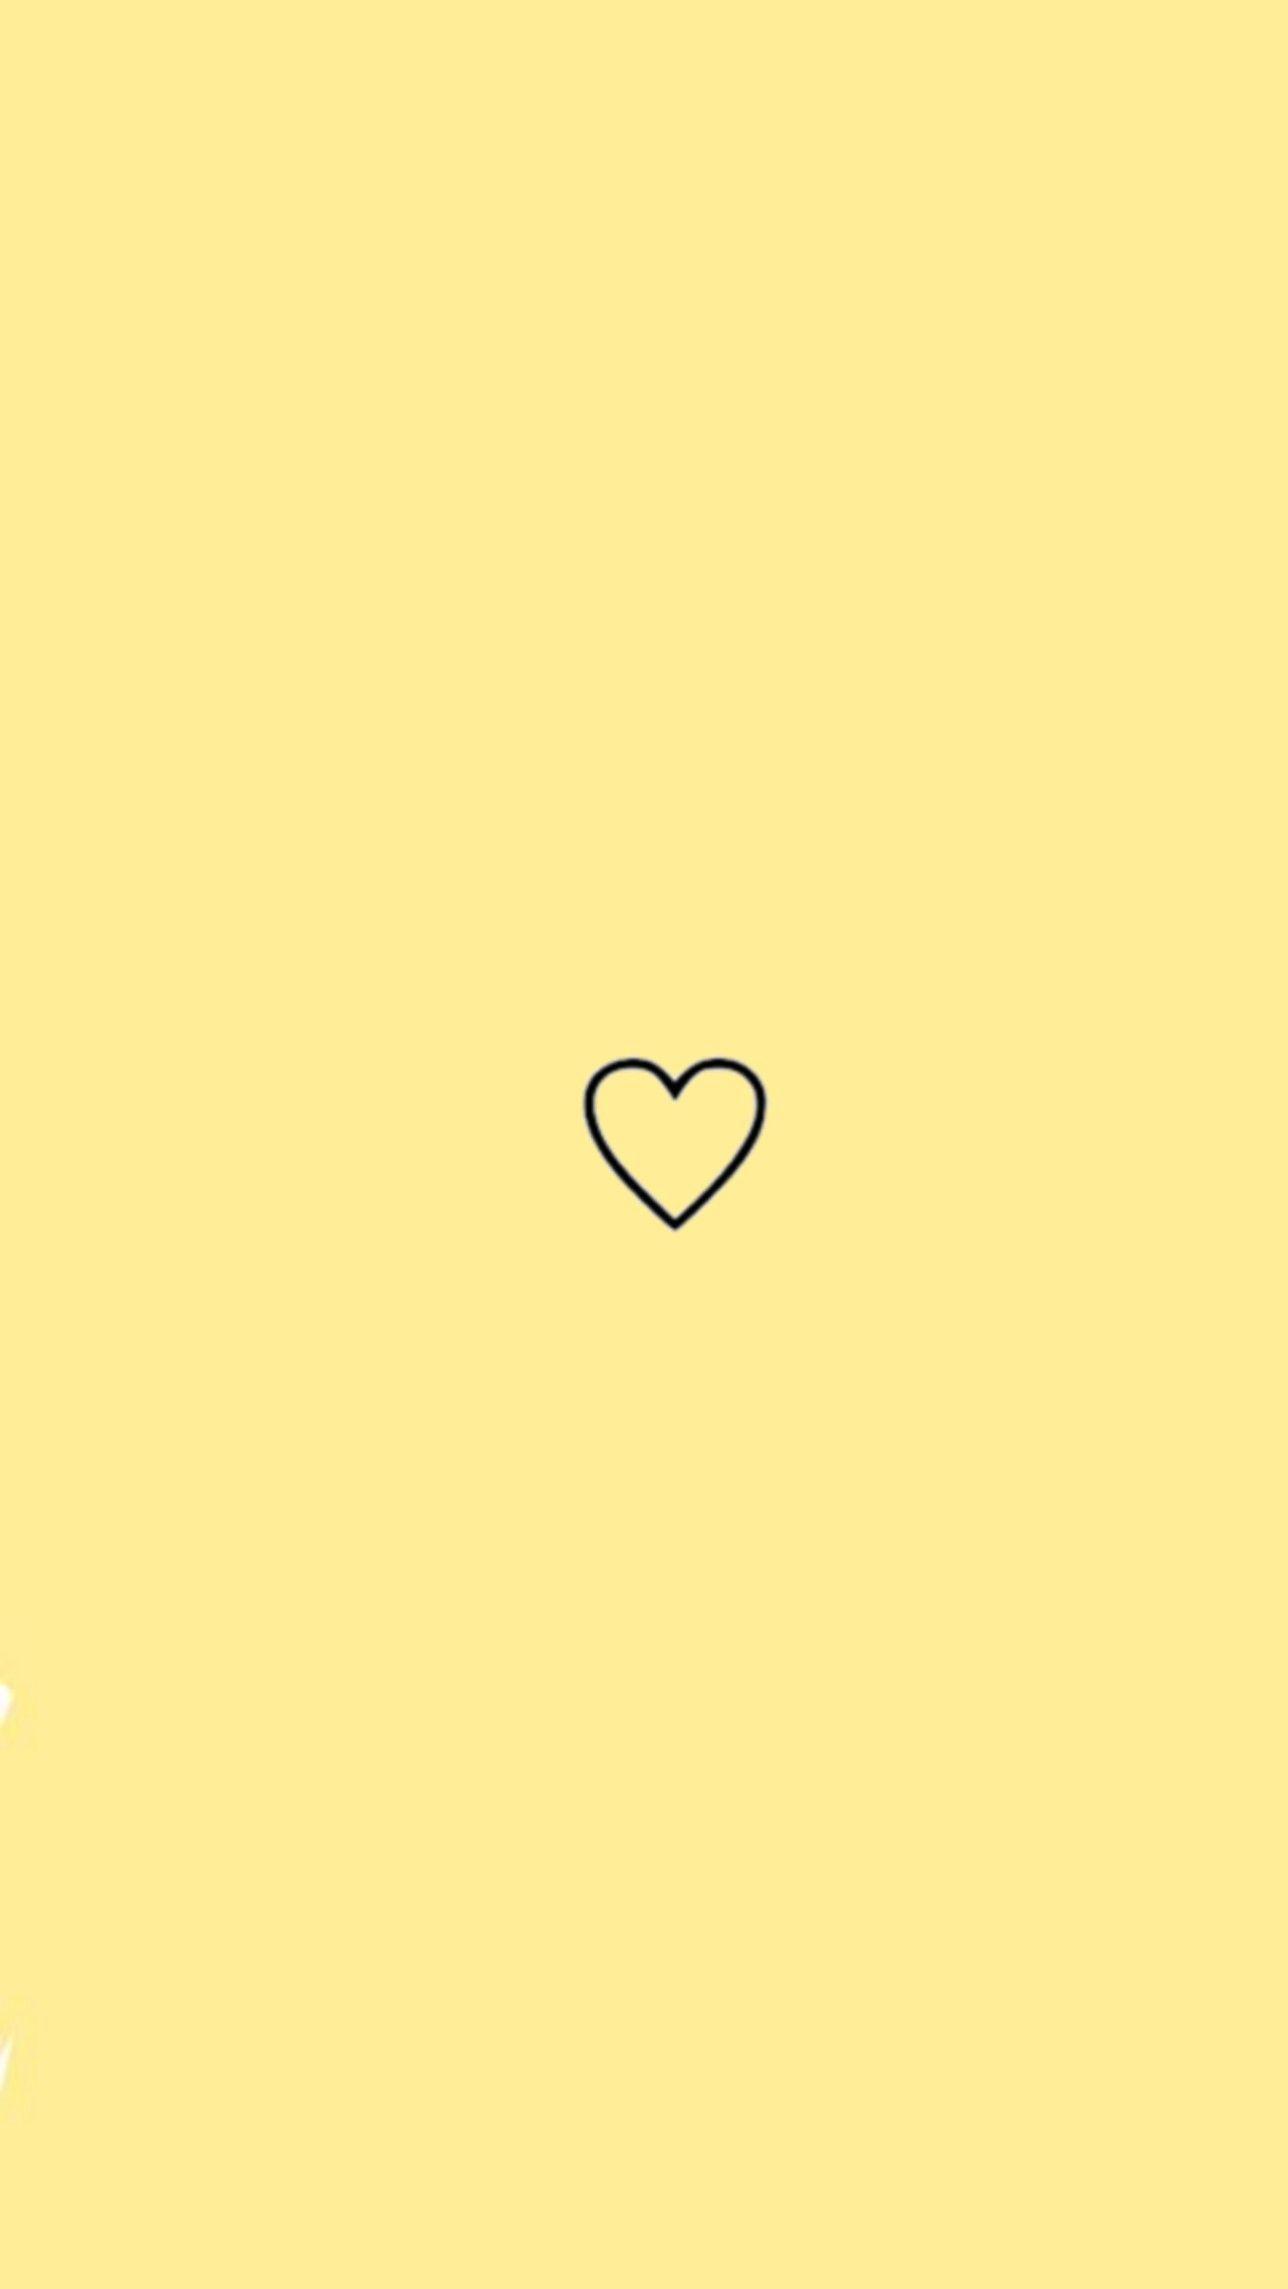 Yellow Aesthetic Heart Iphone Wallpaper Yellow Yellow Aesthetic Purple Wallpaper Iphone